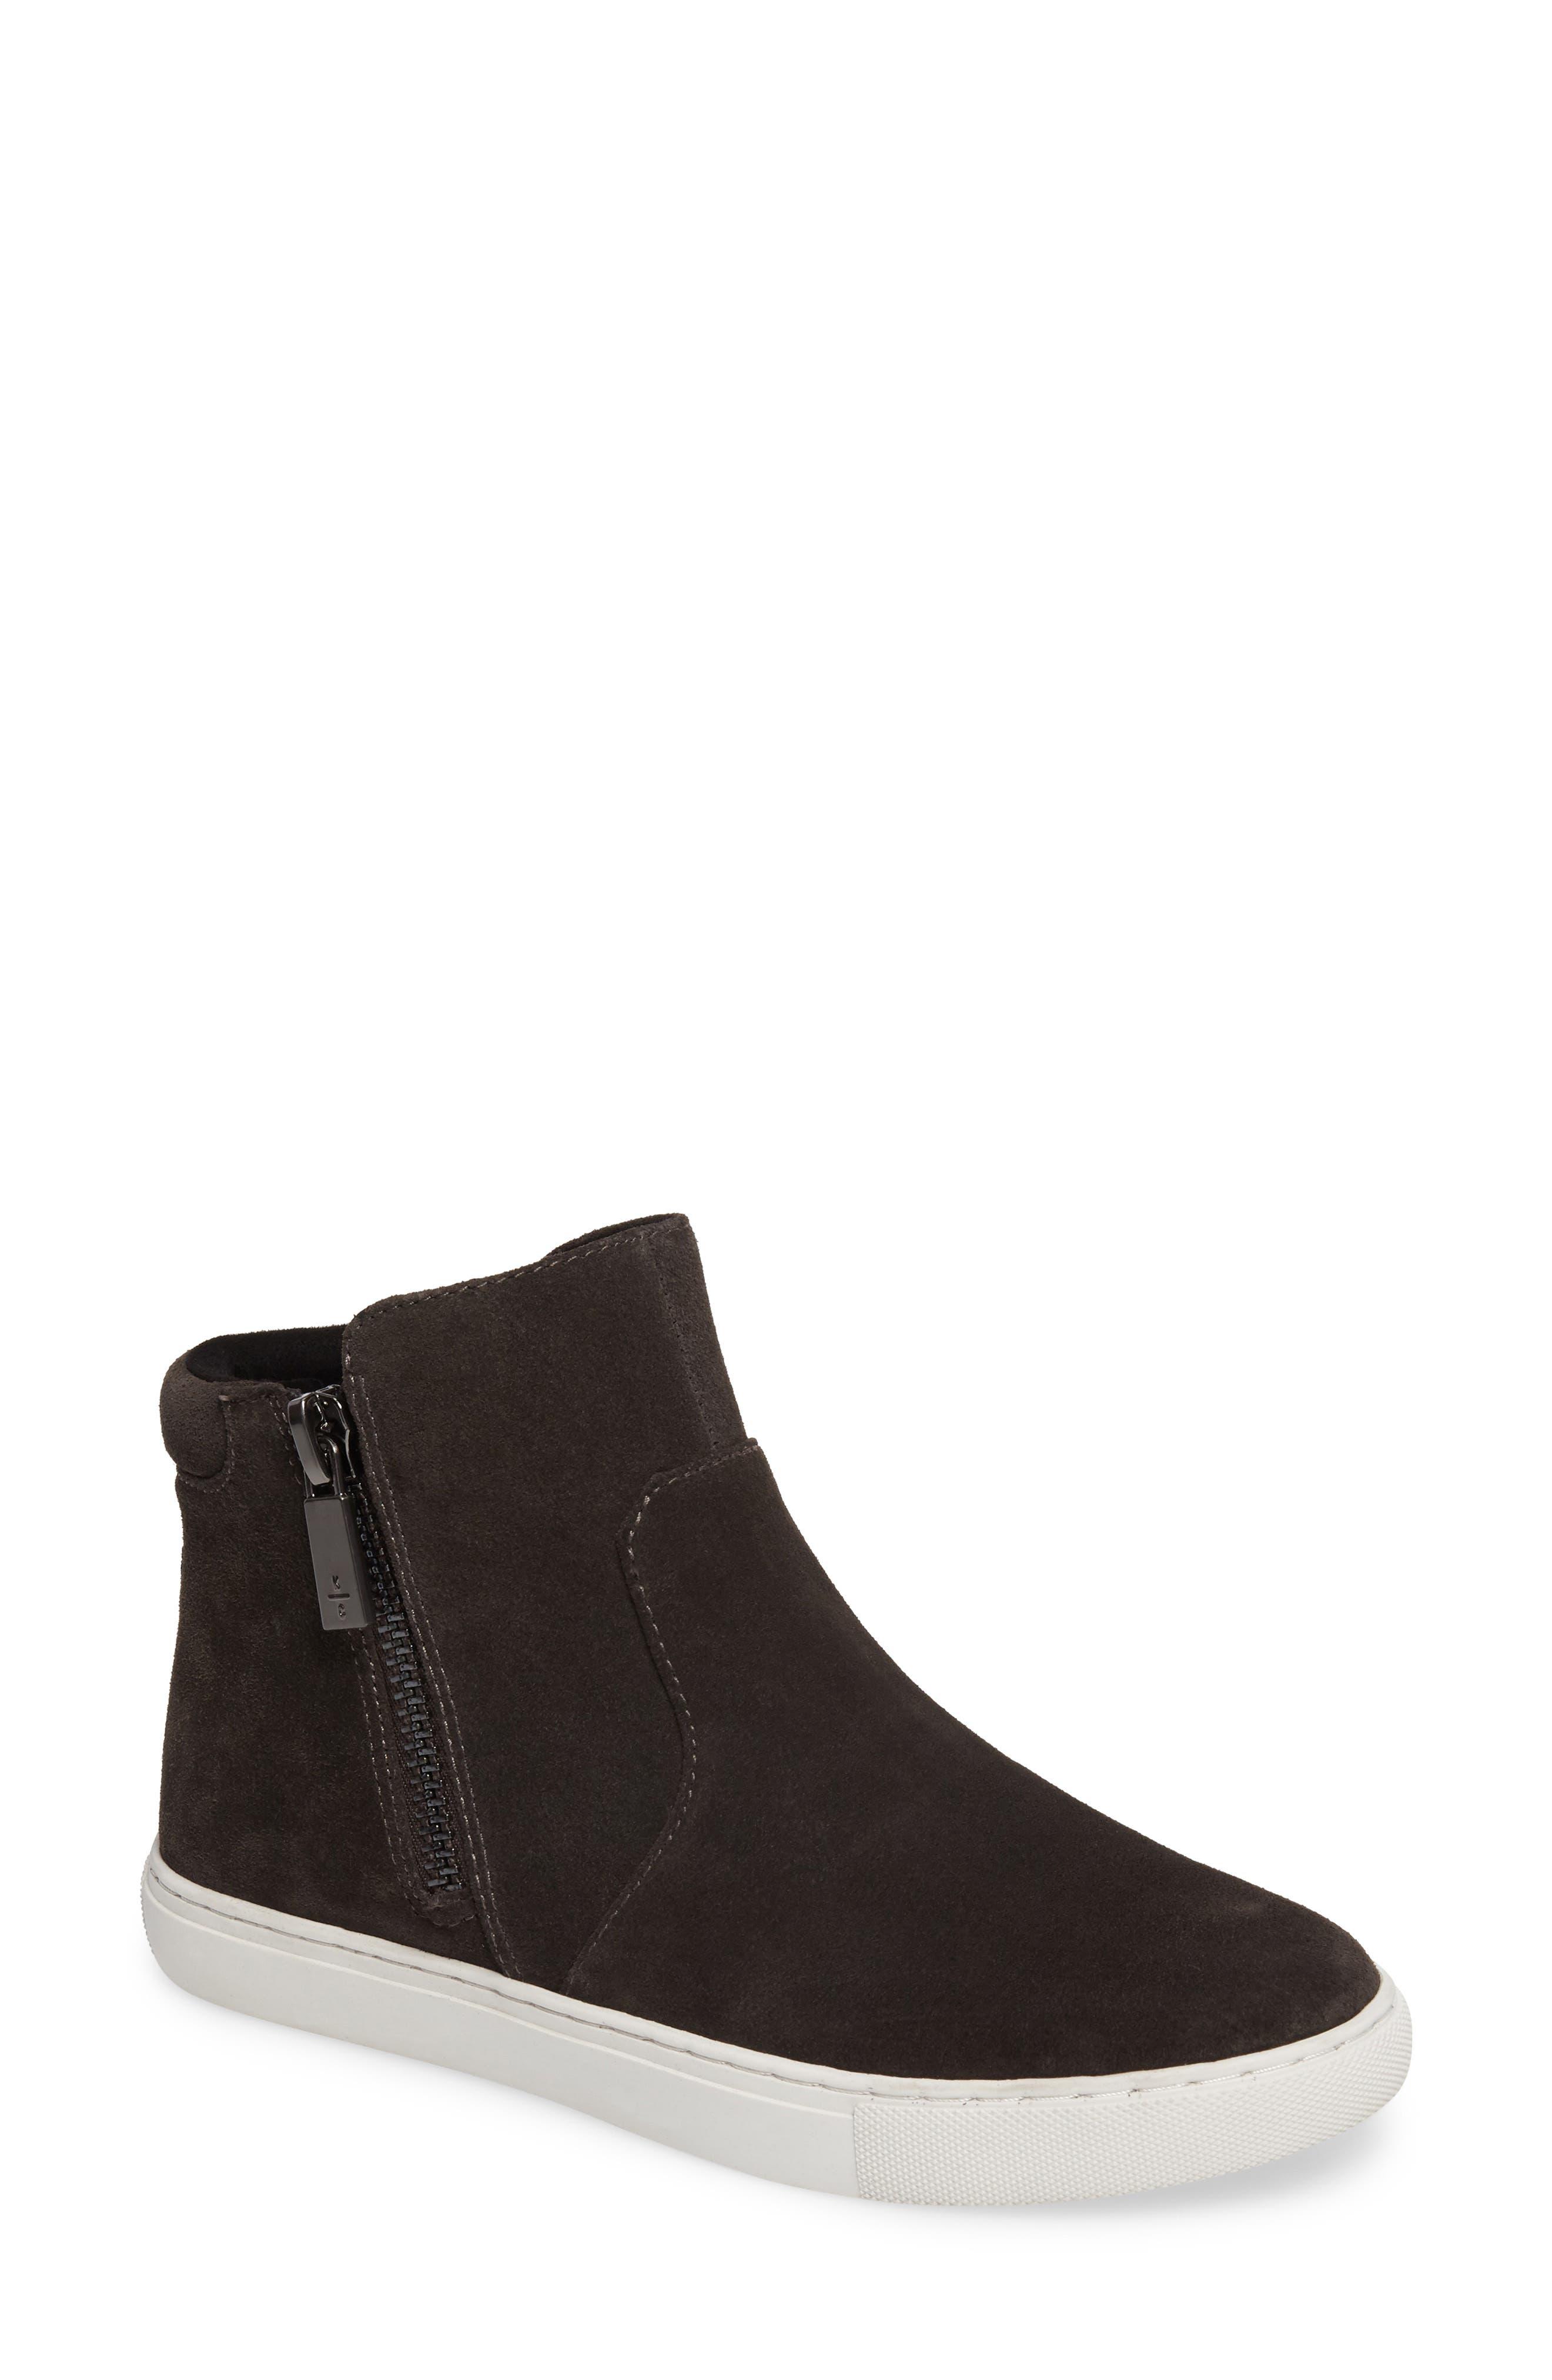 'Kiera' Zip High Top Sneaker,                             Main thumbnail 1, color,                             Asphalt Suede